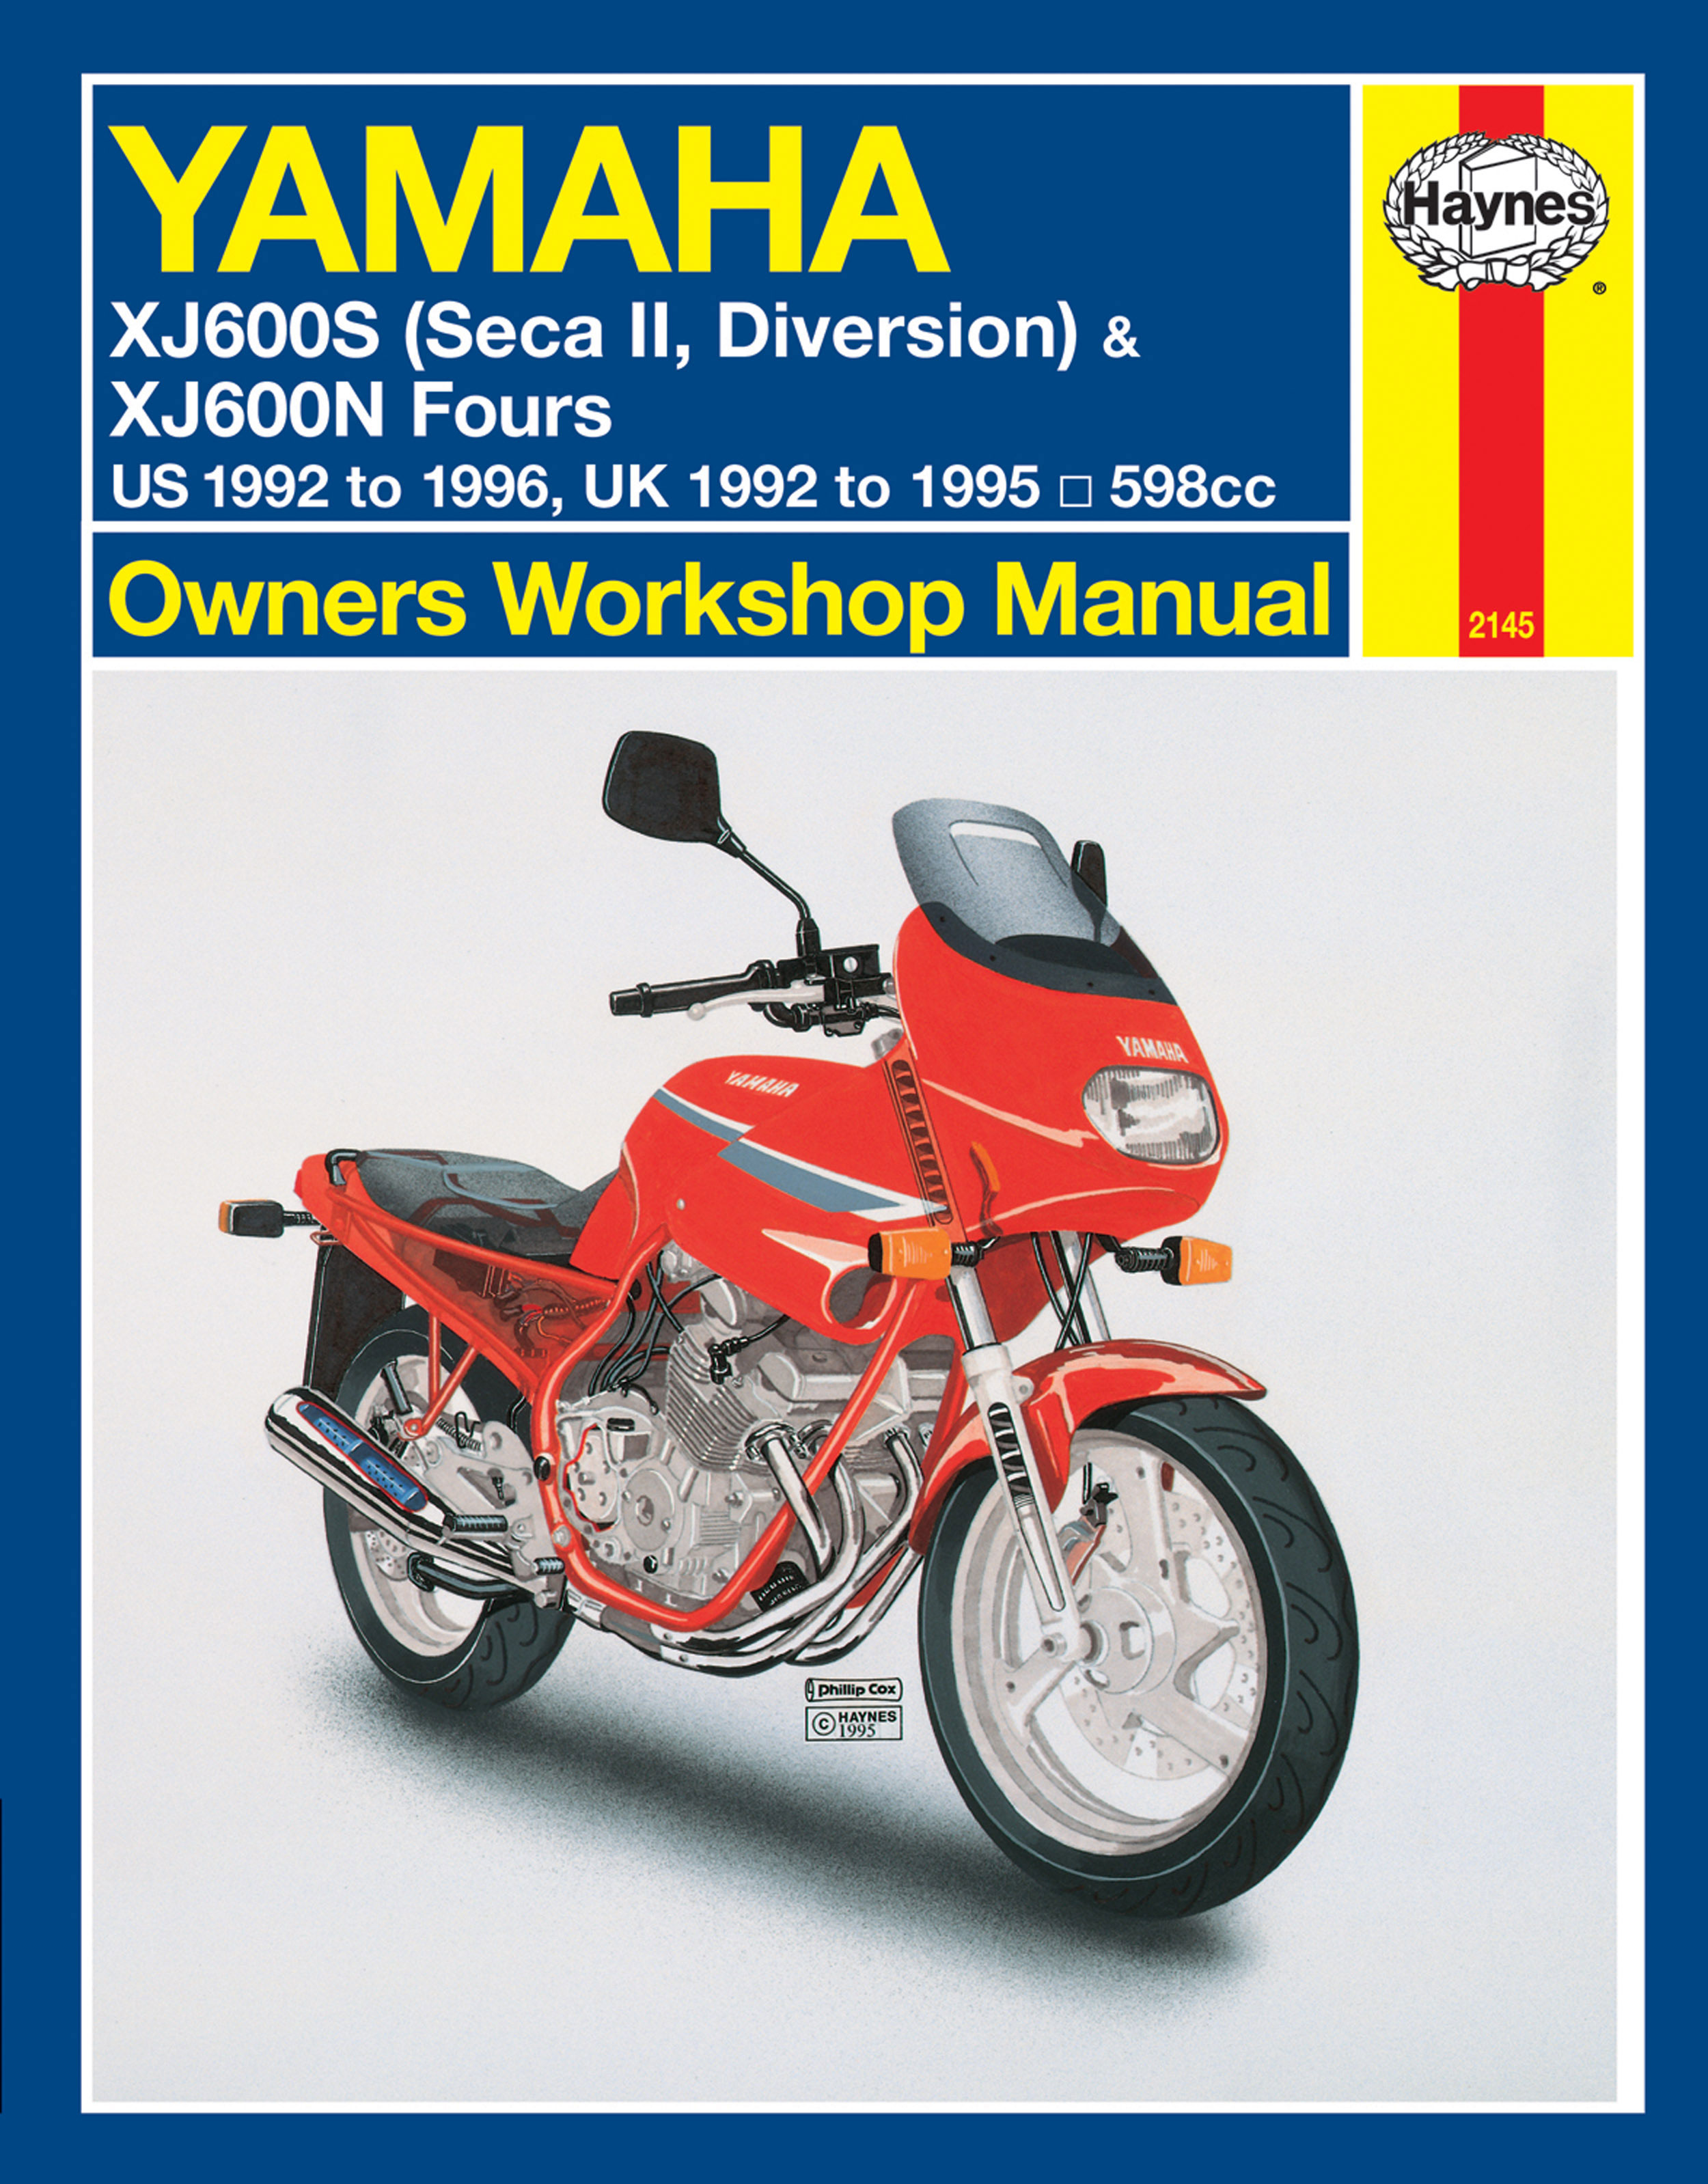 haynes repair manual yamaha xj600s diversion seca ii 92 03 rh ebay com Seca II Street Fighter 1998 Yamaha Seca II